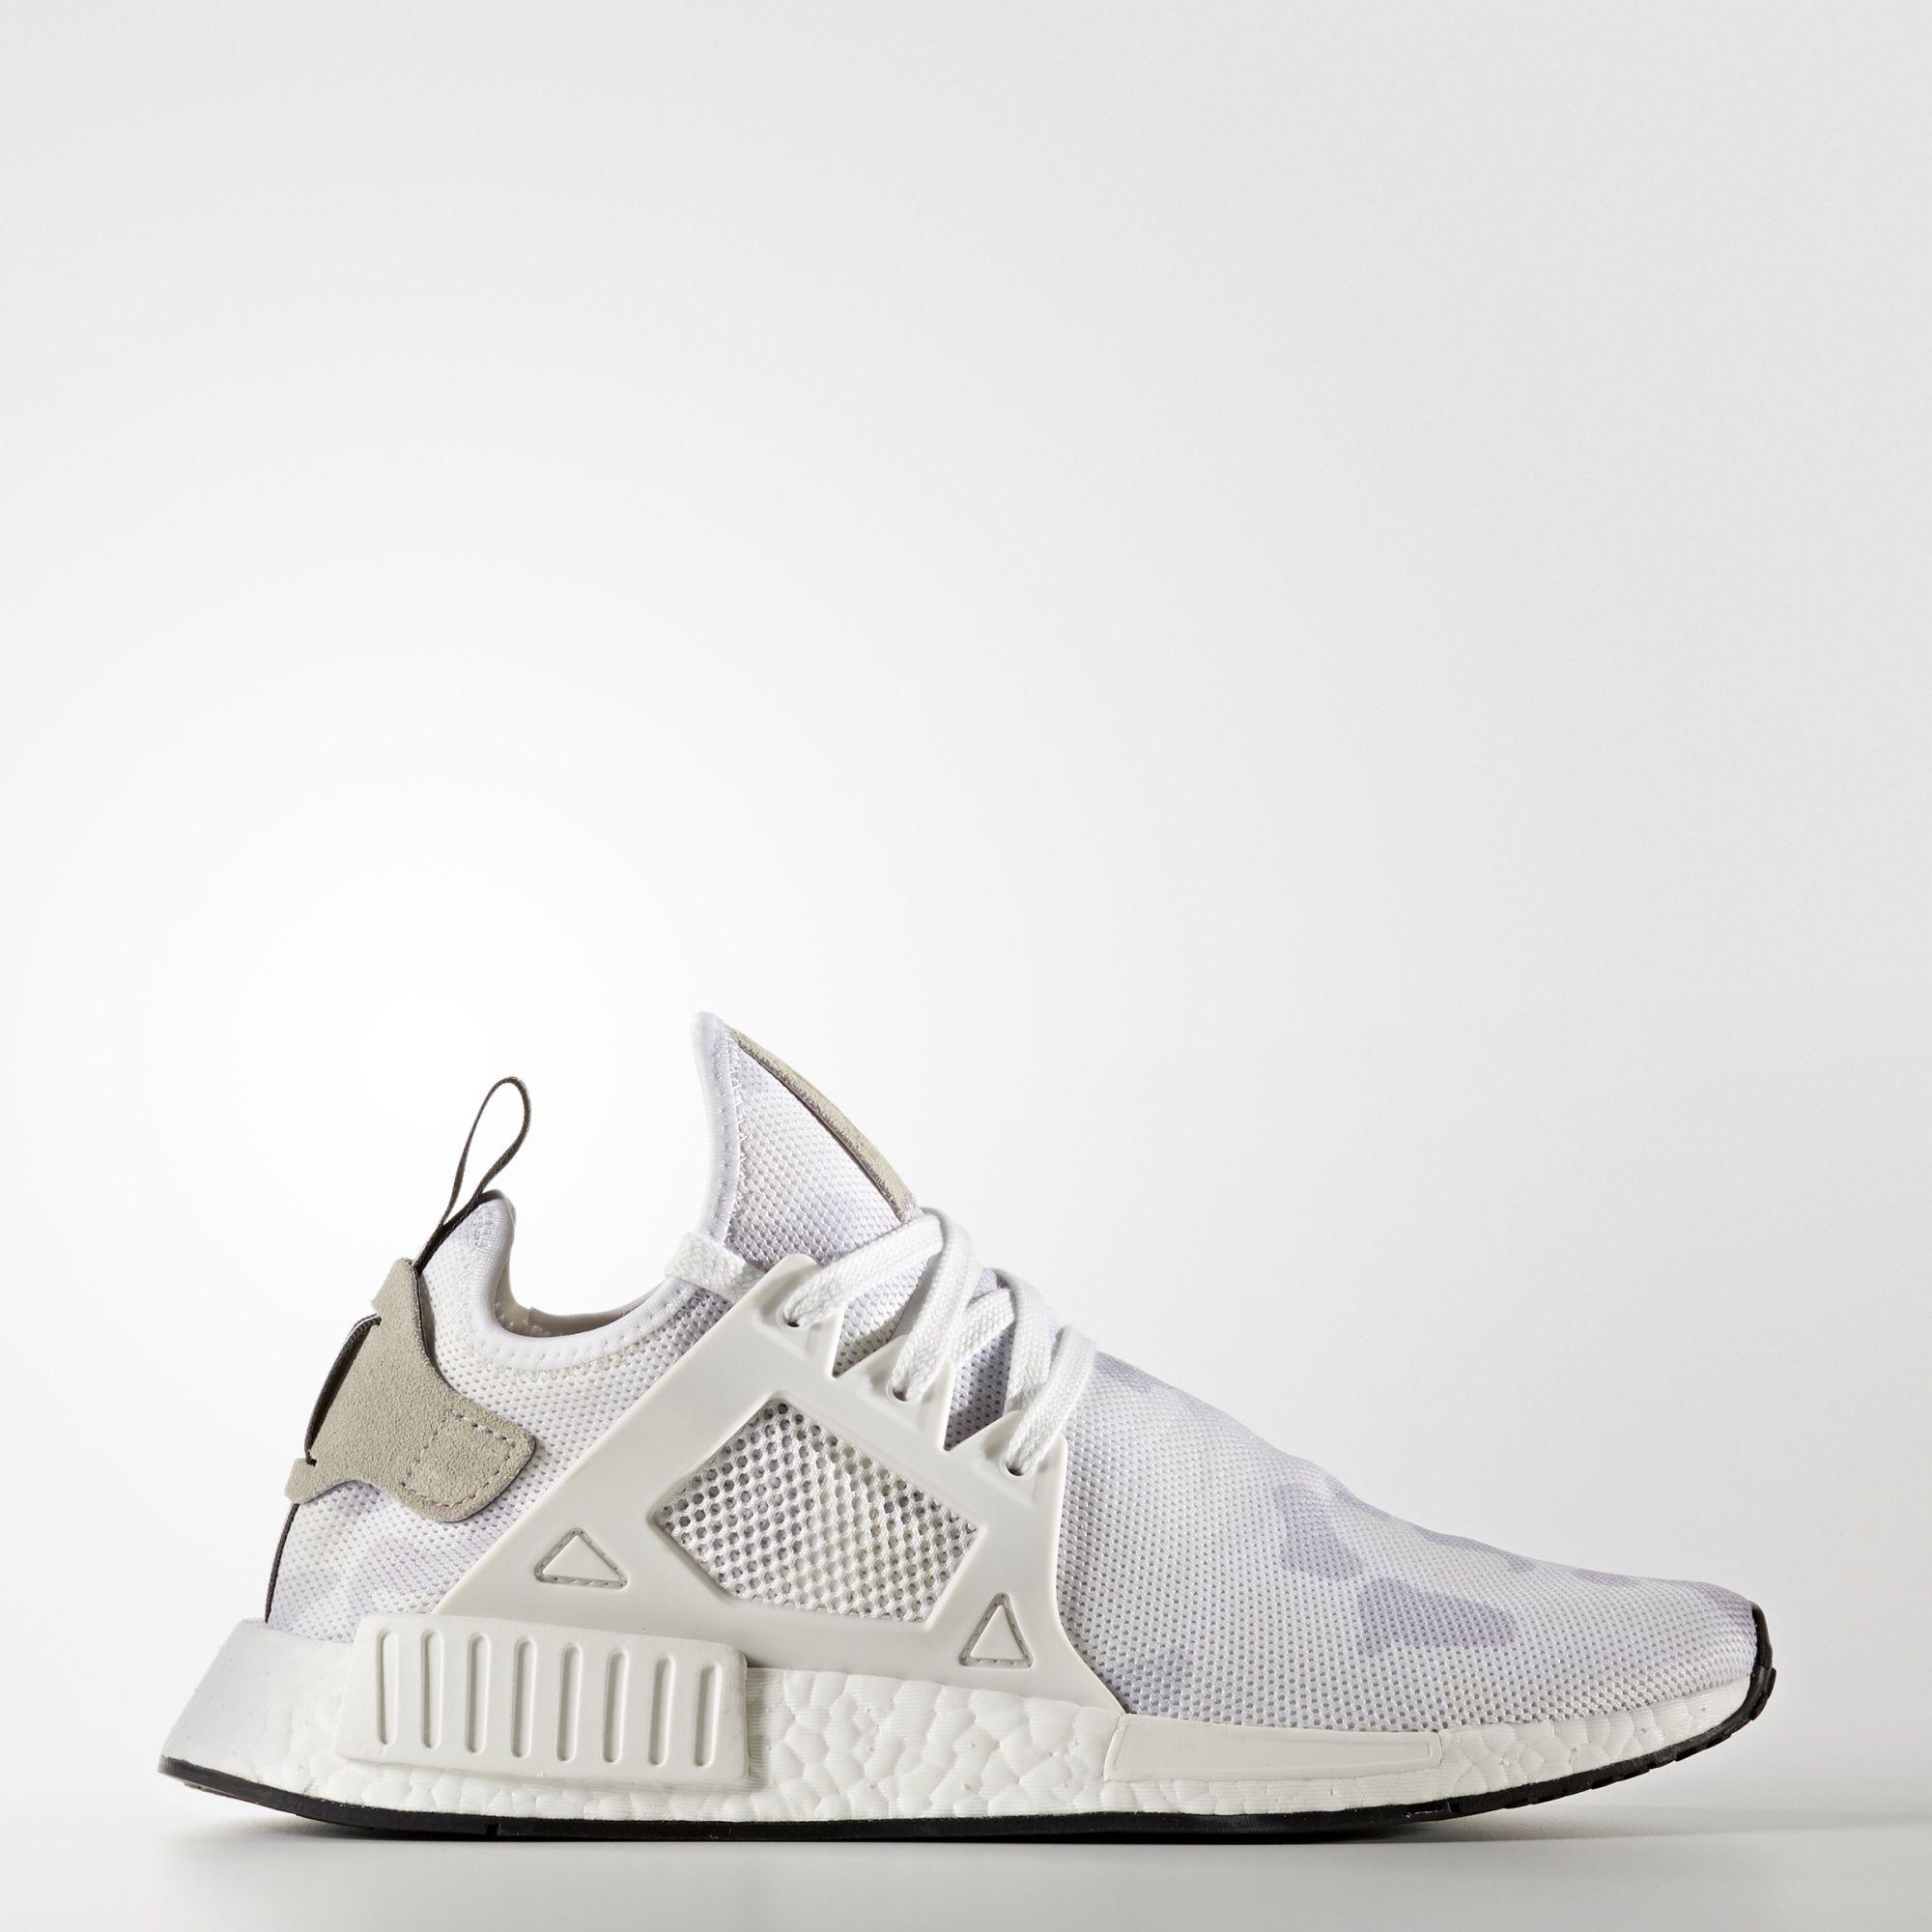 online store 296dd baaa8 Chaussures Adidas Nmd Homme En Ligne Tea324